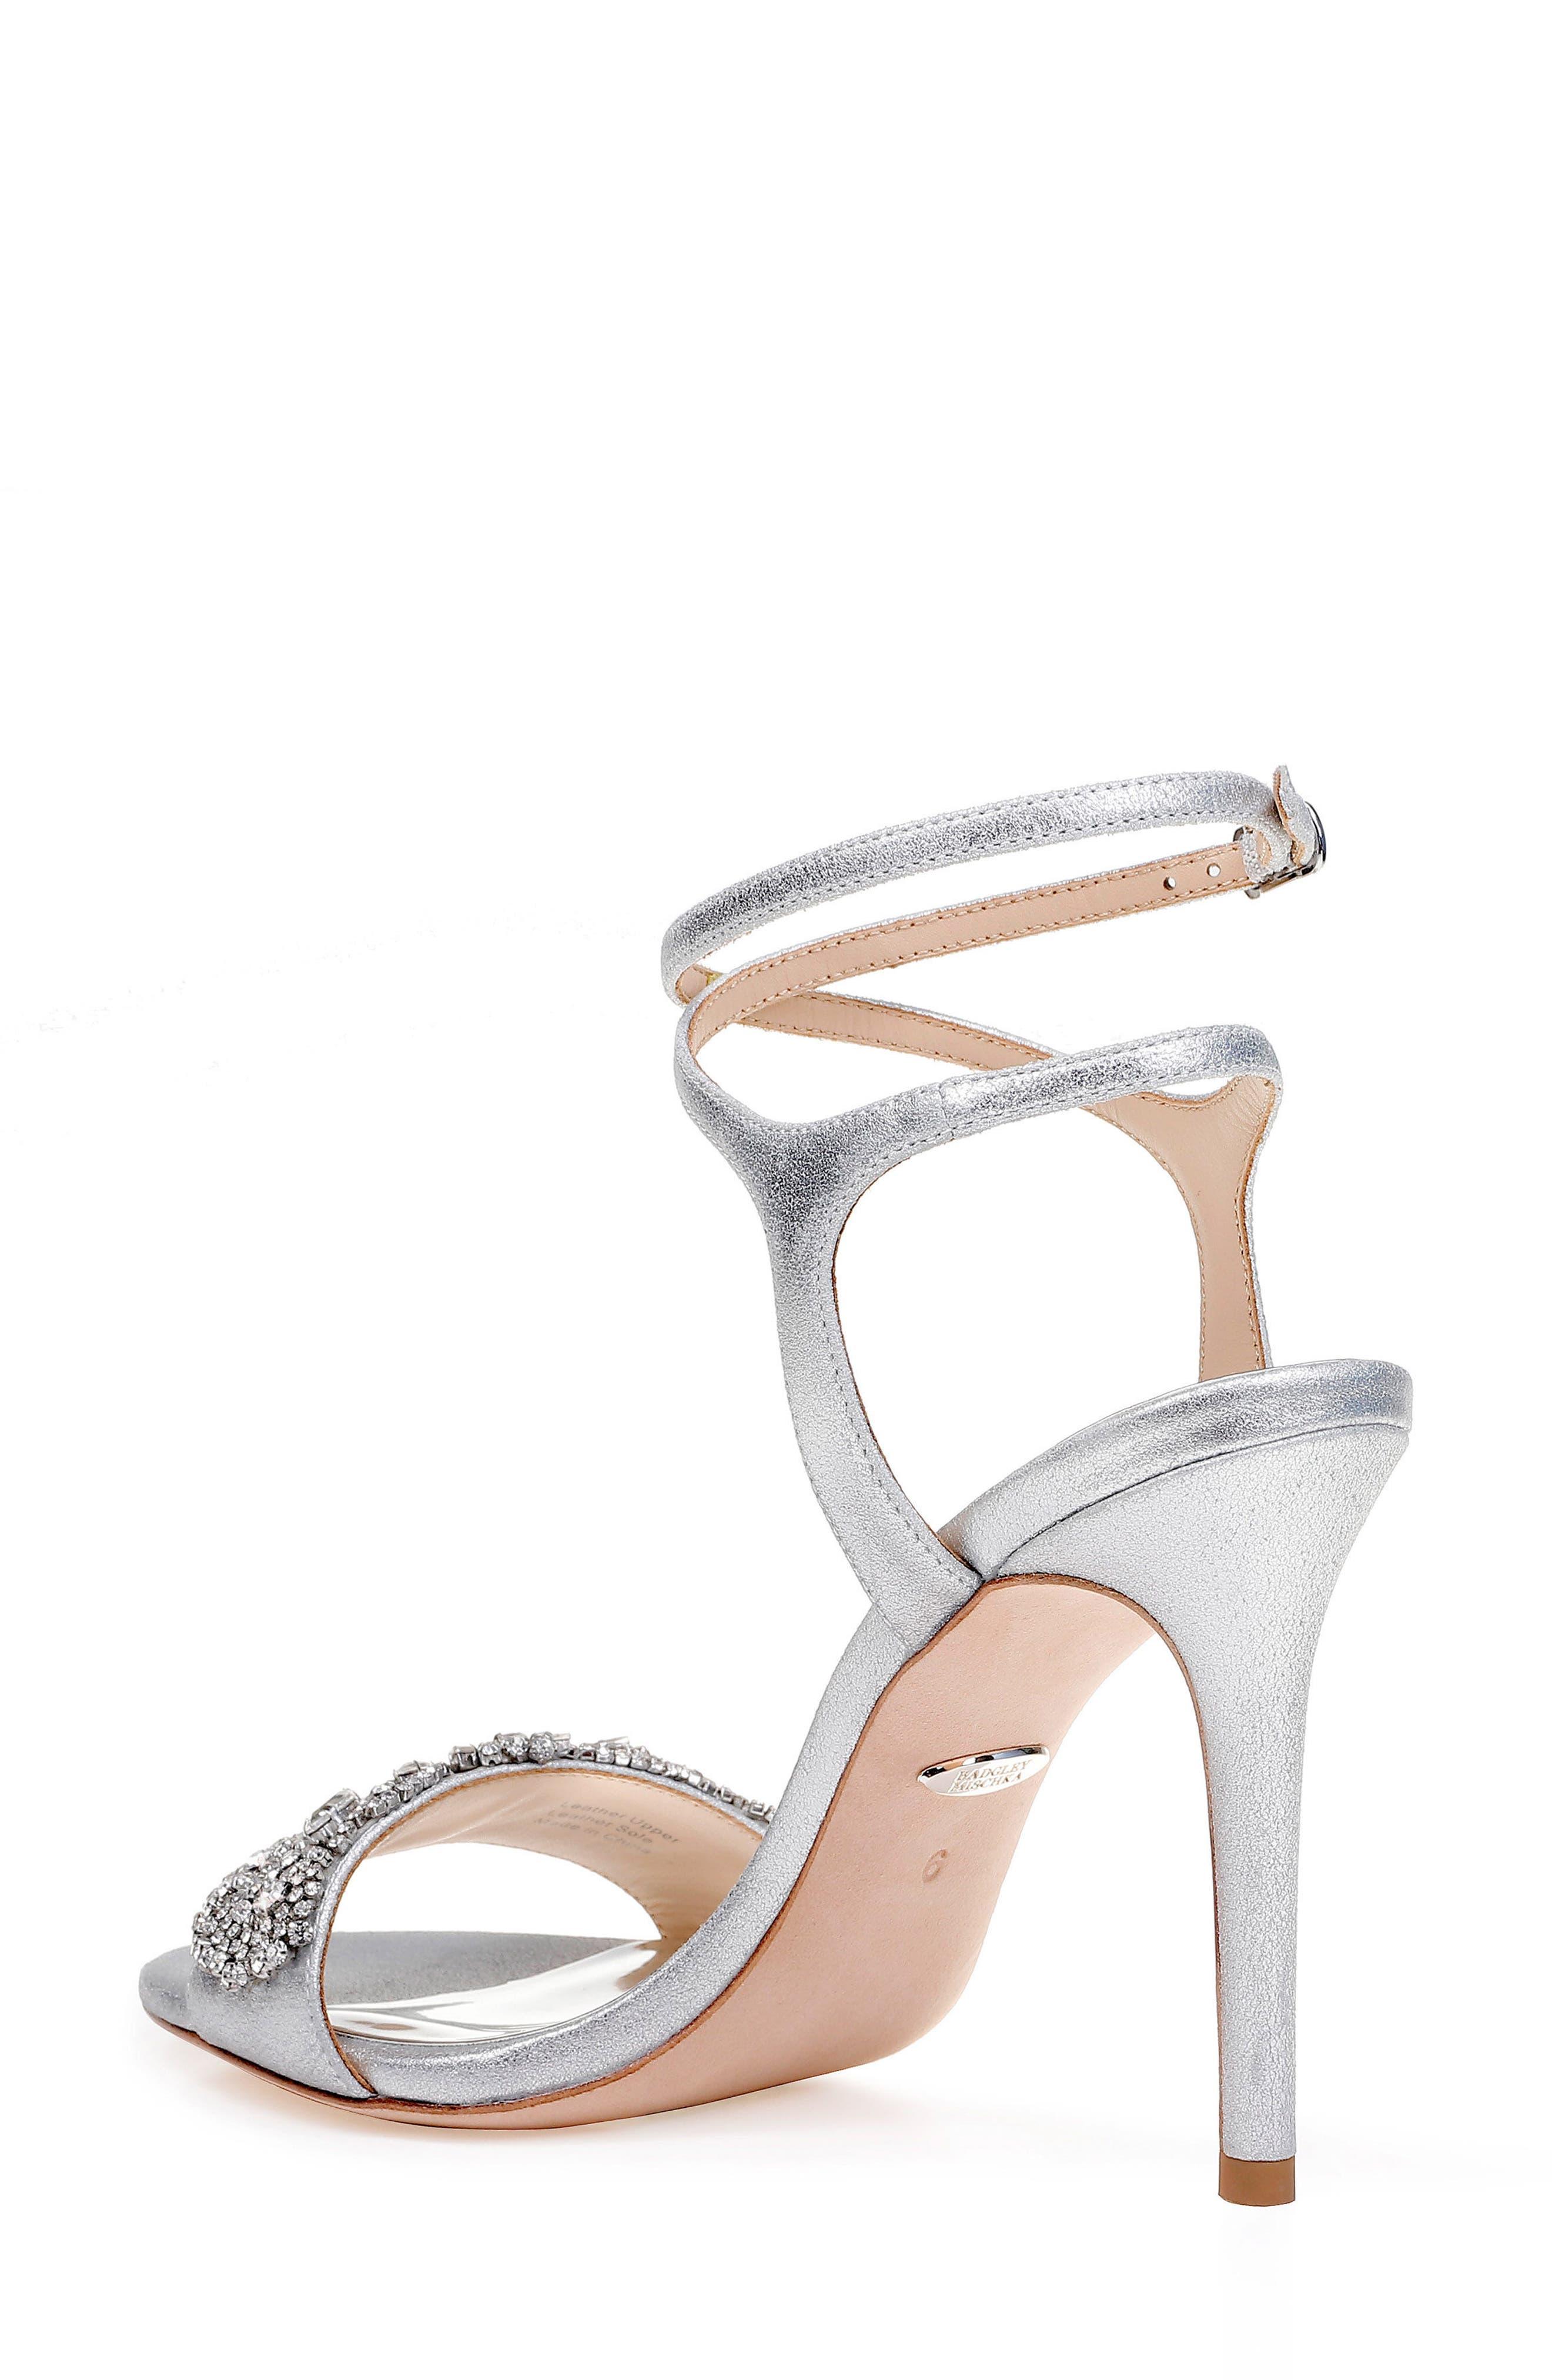 Hailey Embellished Ankle Strap Sandal,                             Alternate thumbnail 2, color,                             Silver Metallic Suede